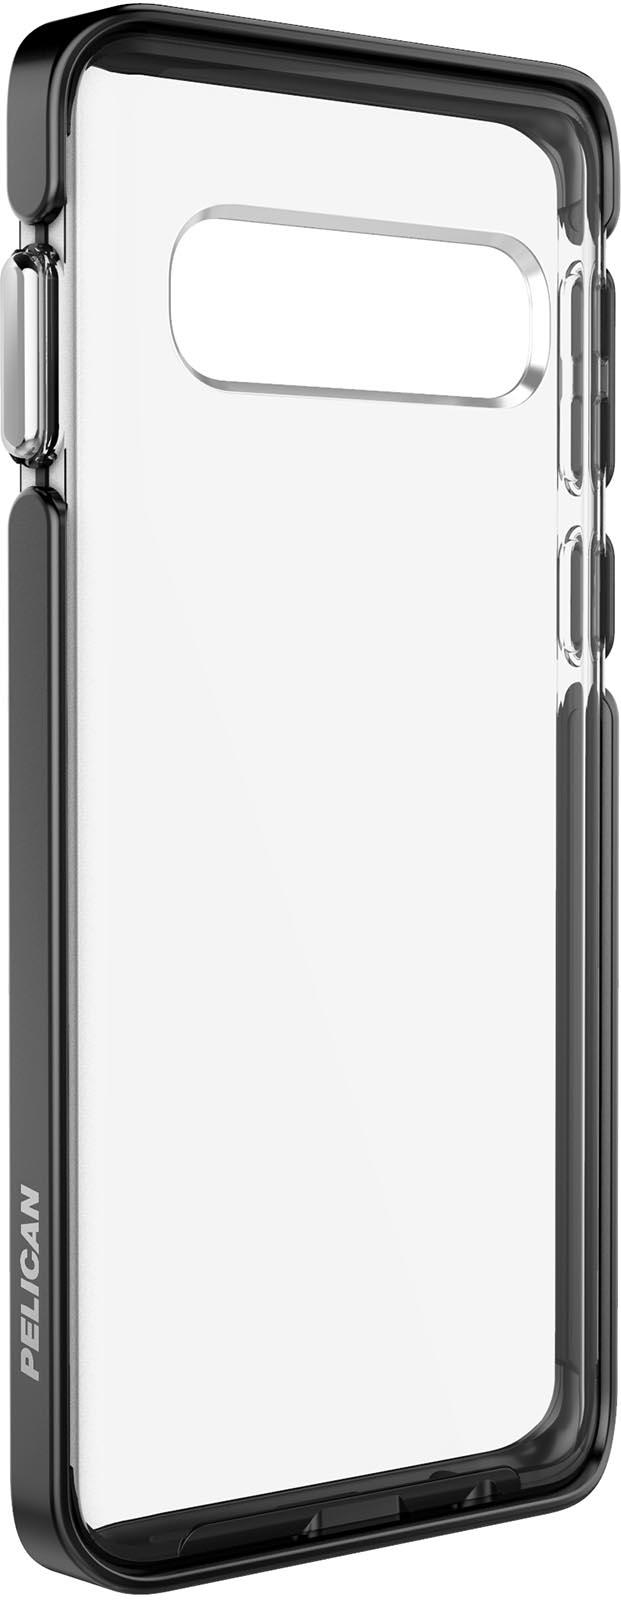 pelican c49130 samsung galaxy s10 ambassador phone case